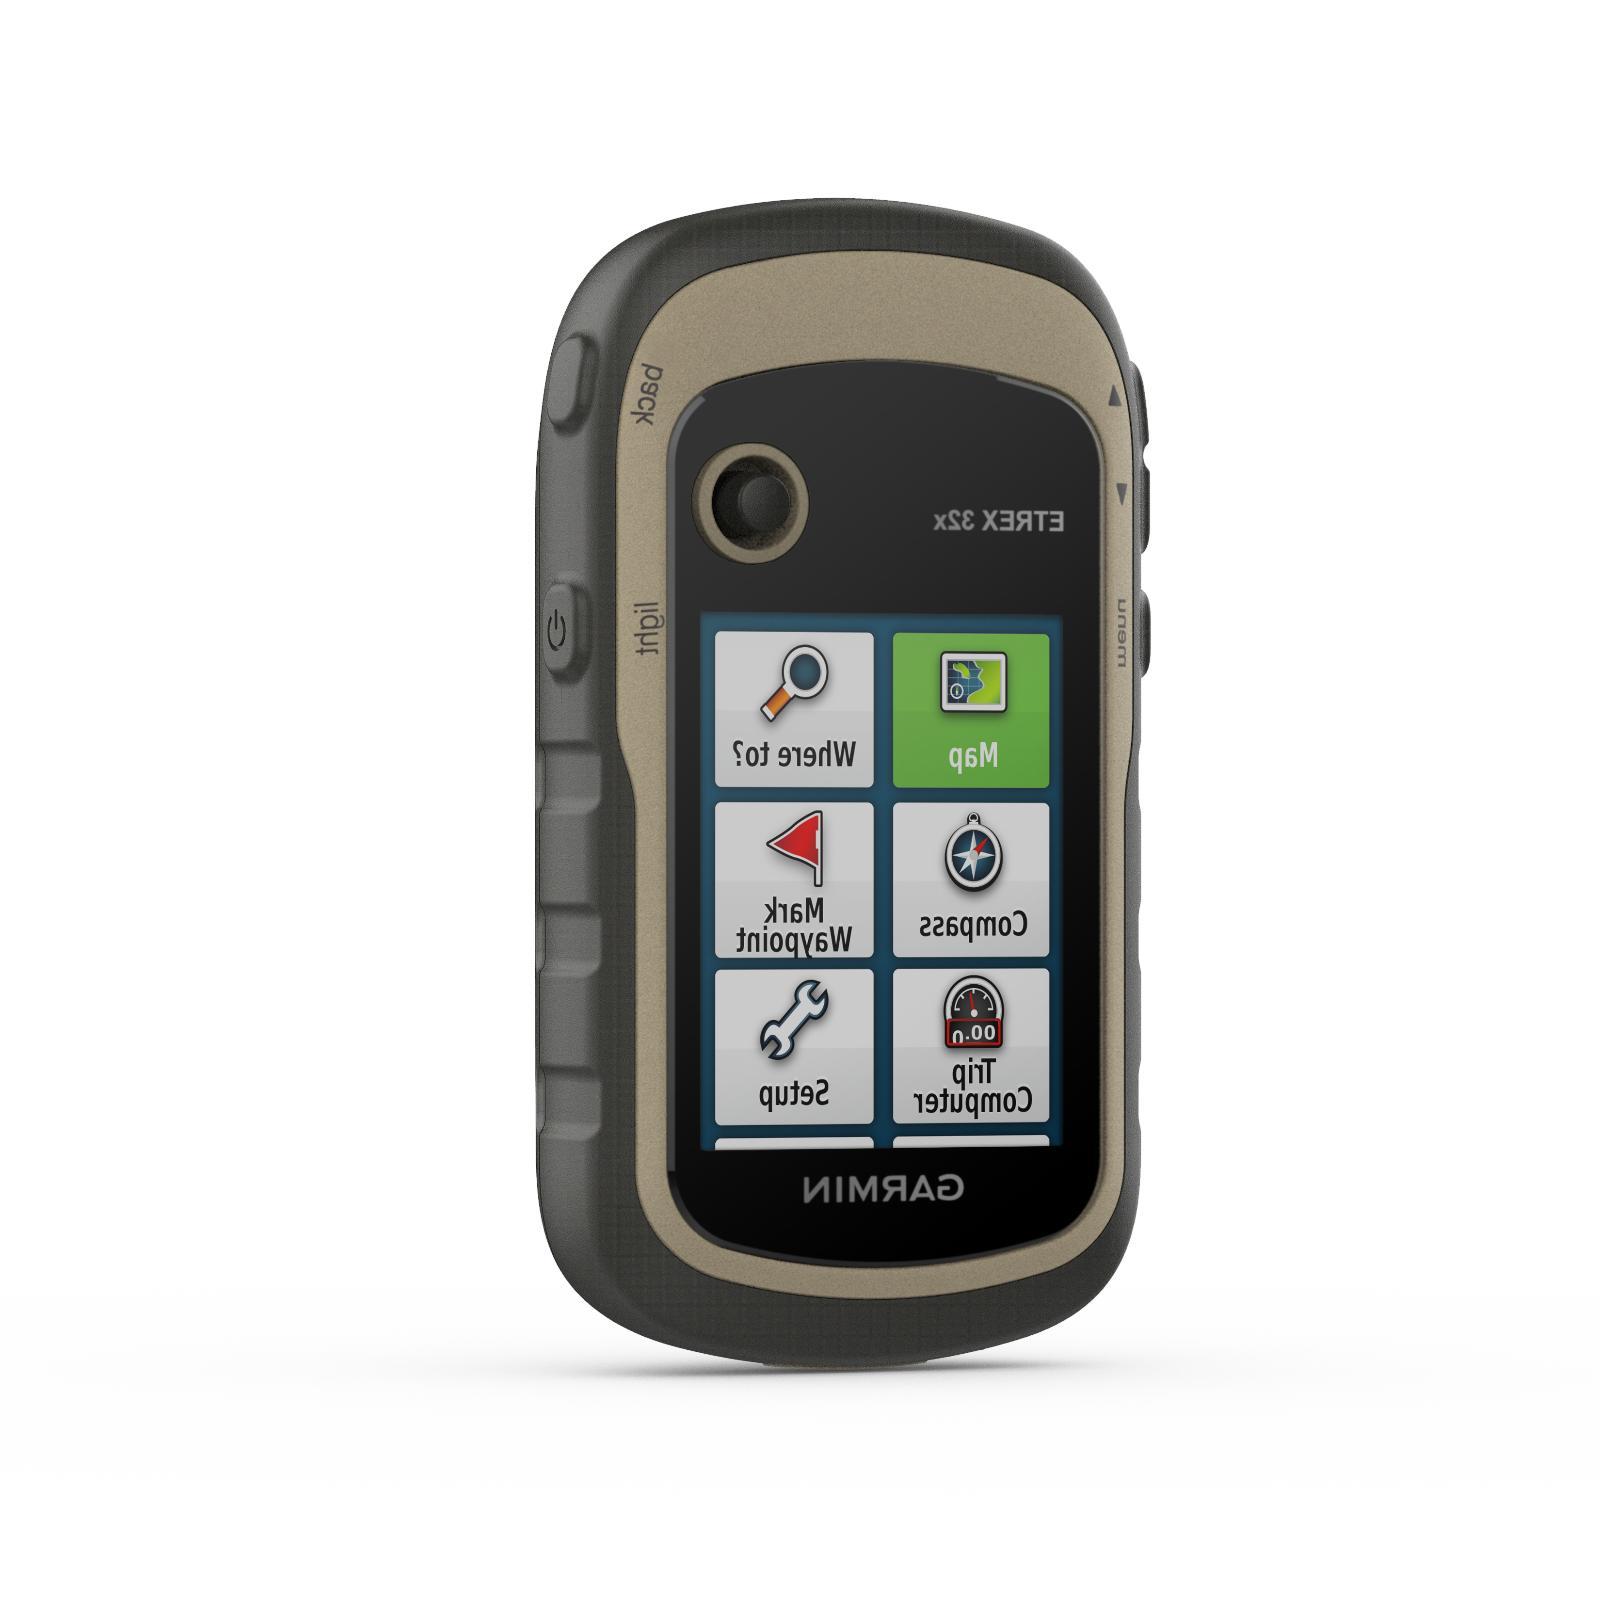 etrex 32x rugged handheld gps w compass